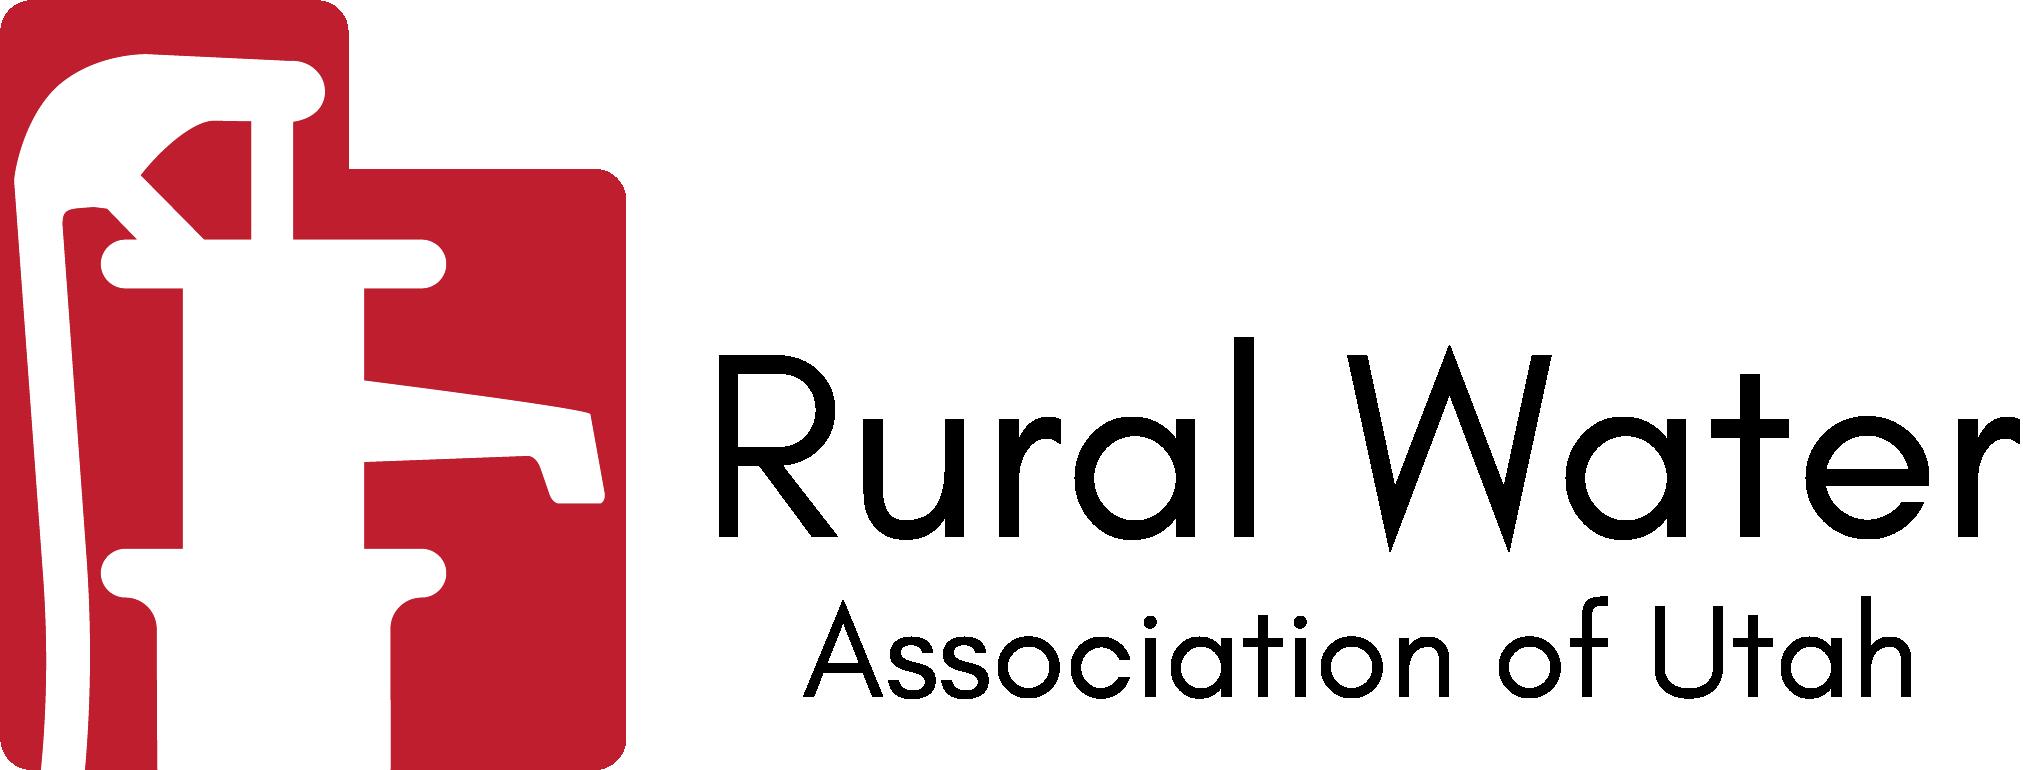 Rural Water Association of Utah Logo